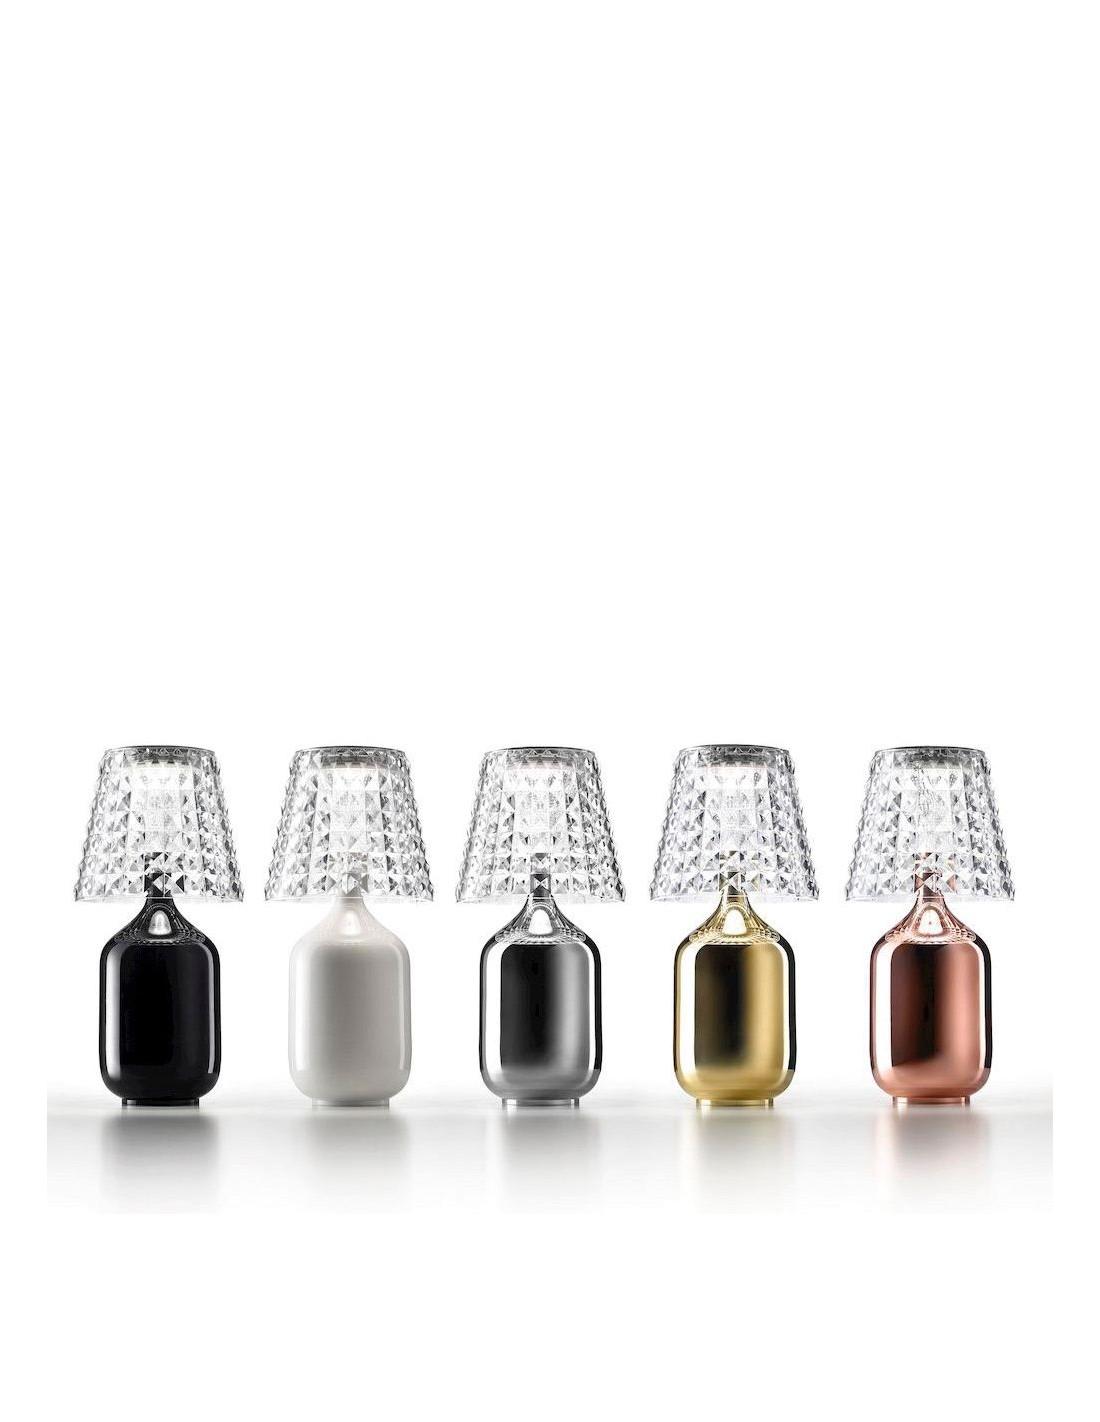 lampe poser valentina famille de studio italia design. Black Bedroom Furniture Sets. Home Design Ideas